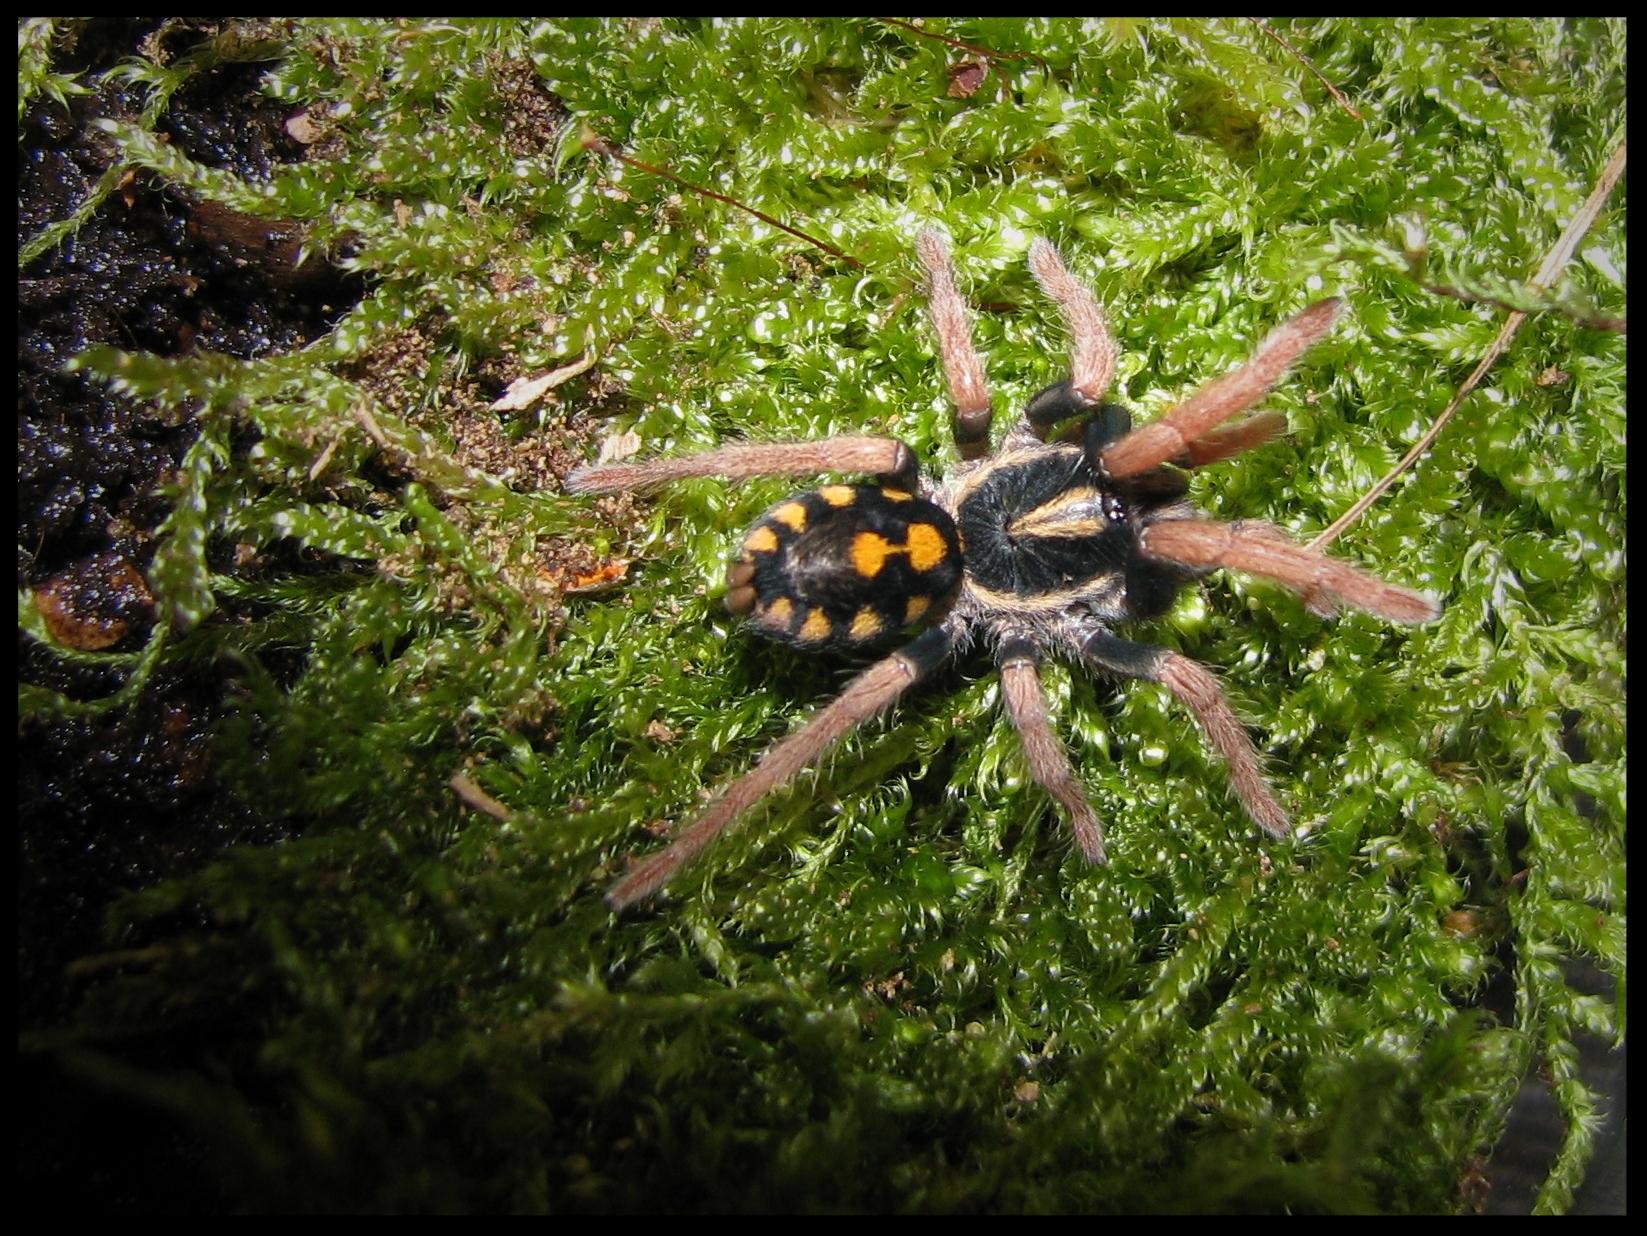 0.1 Hapalopus triseriatus 'highland'